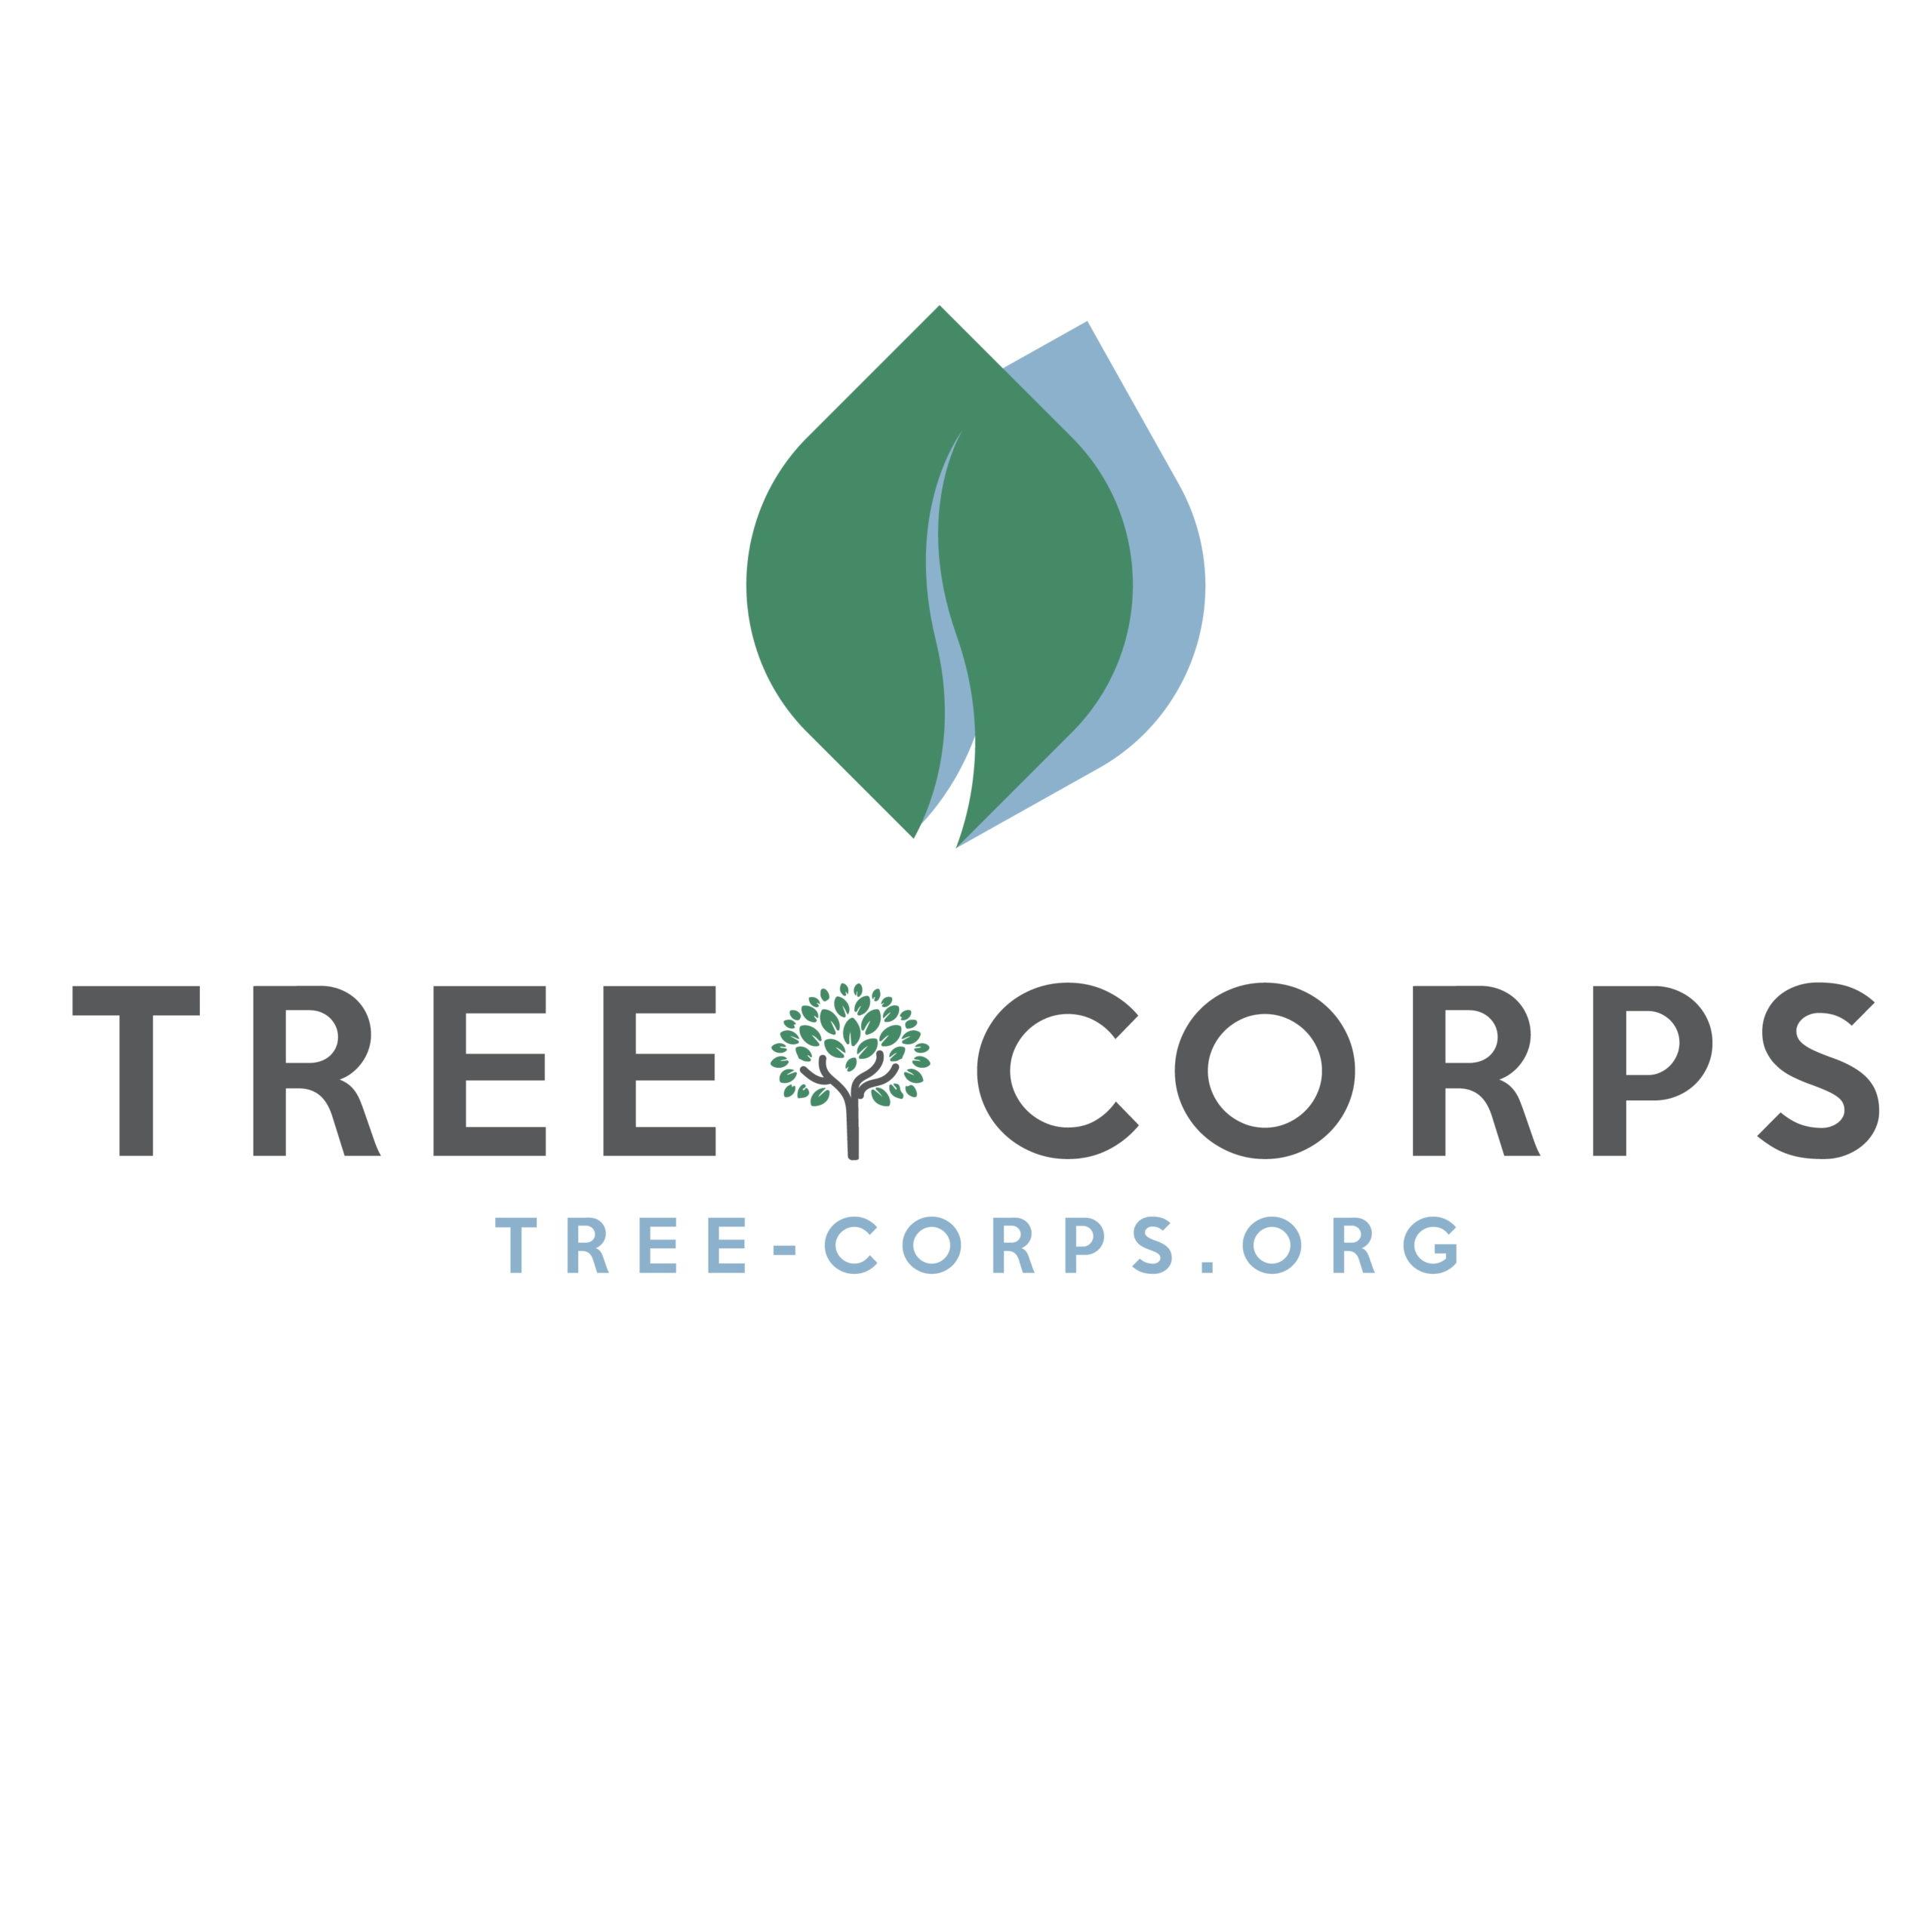 Tree Corps